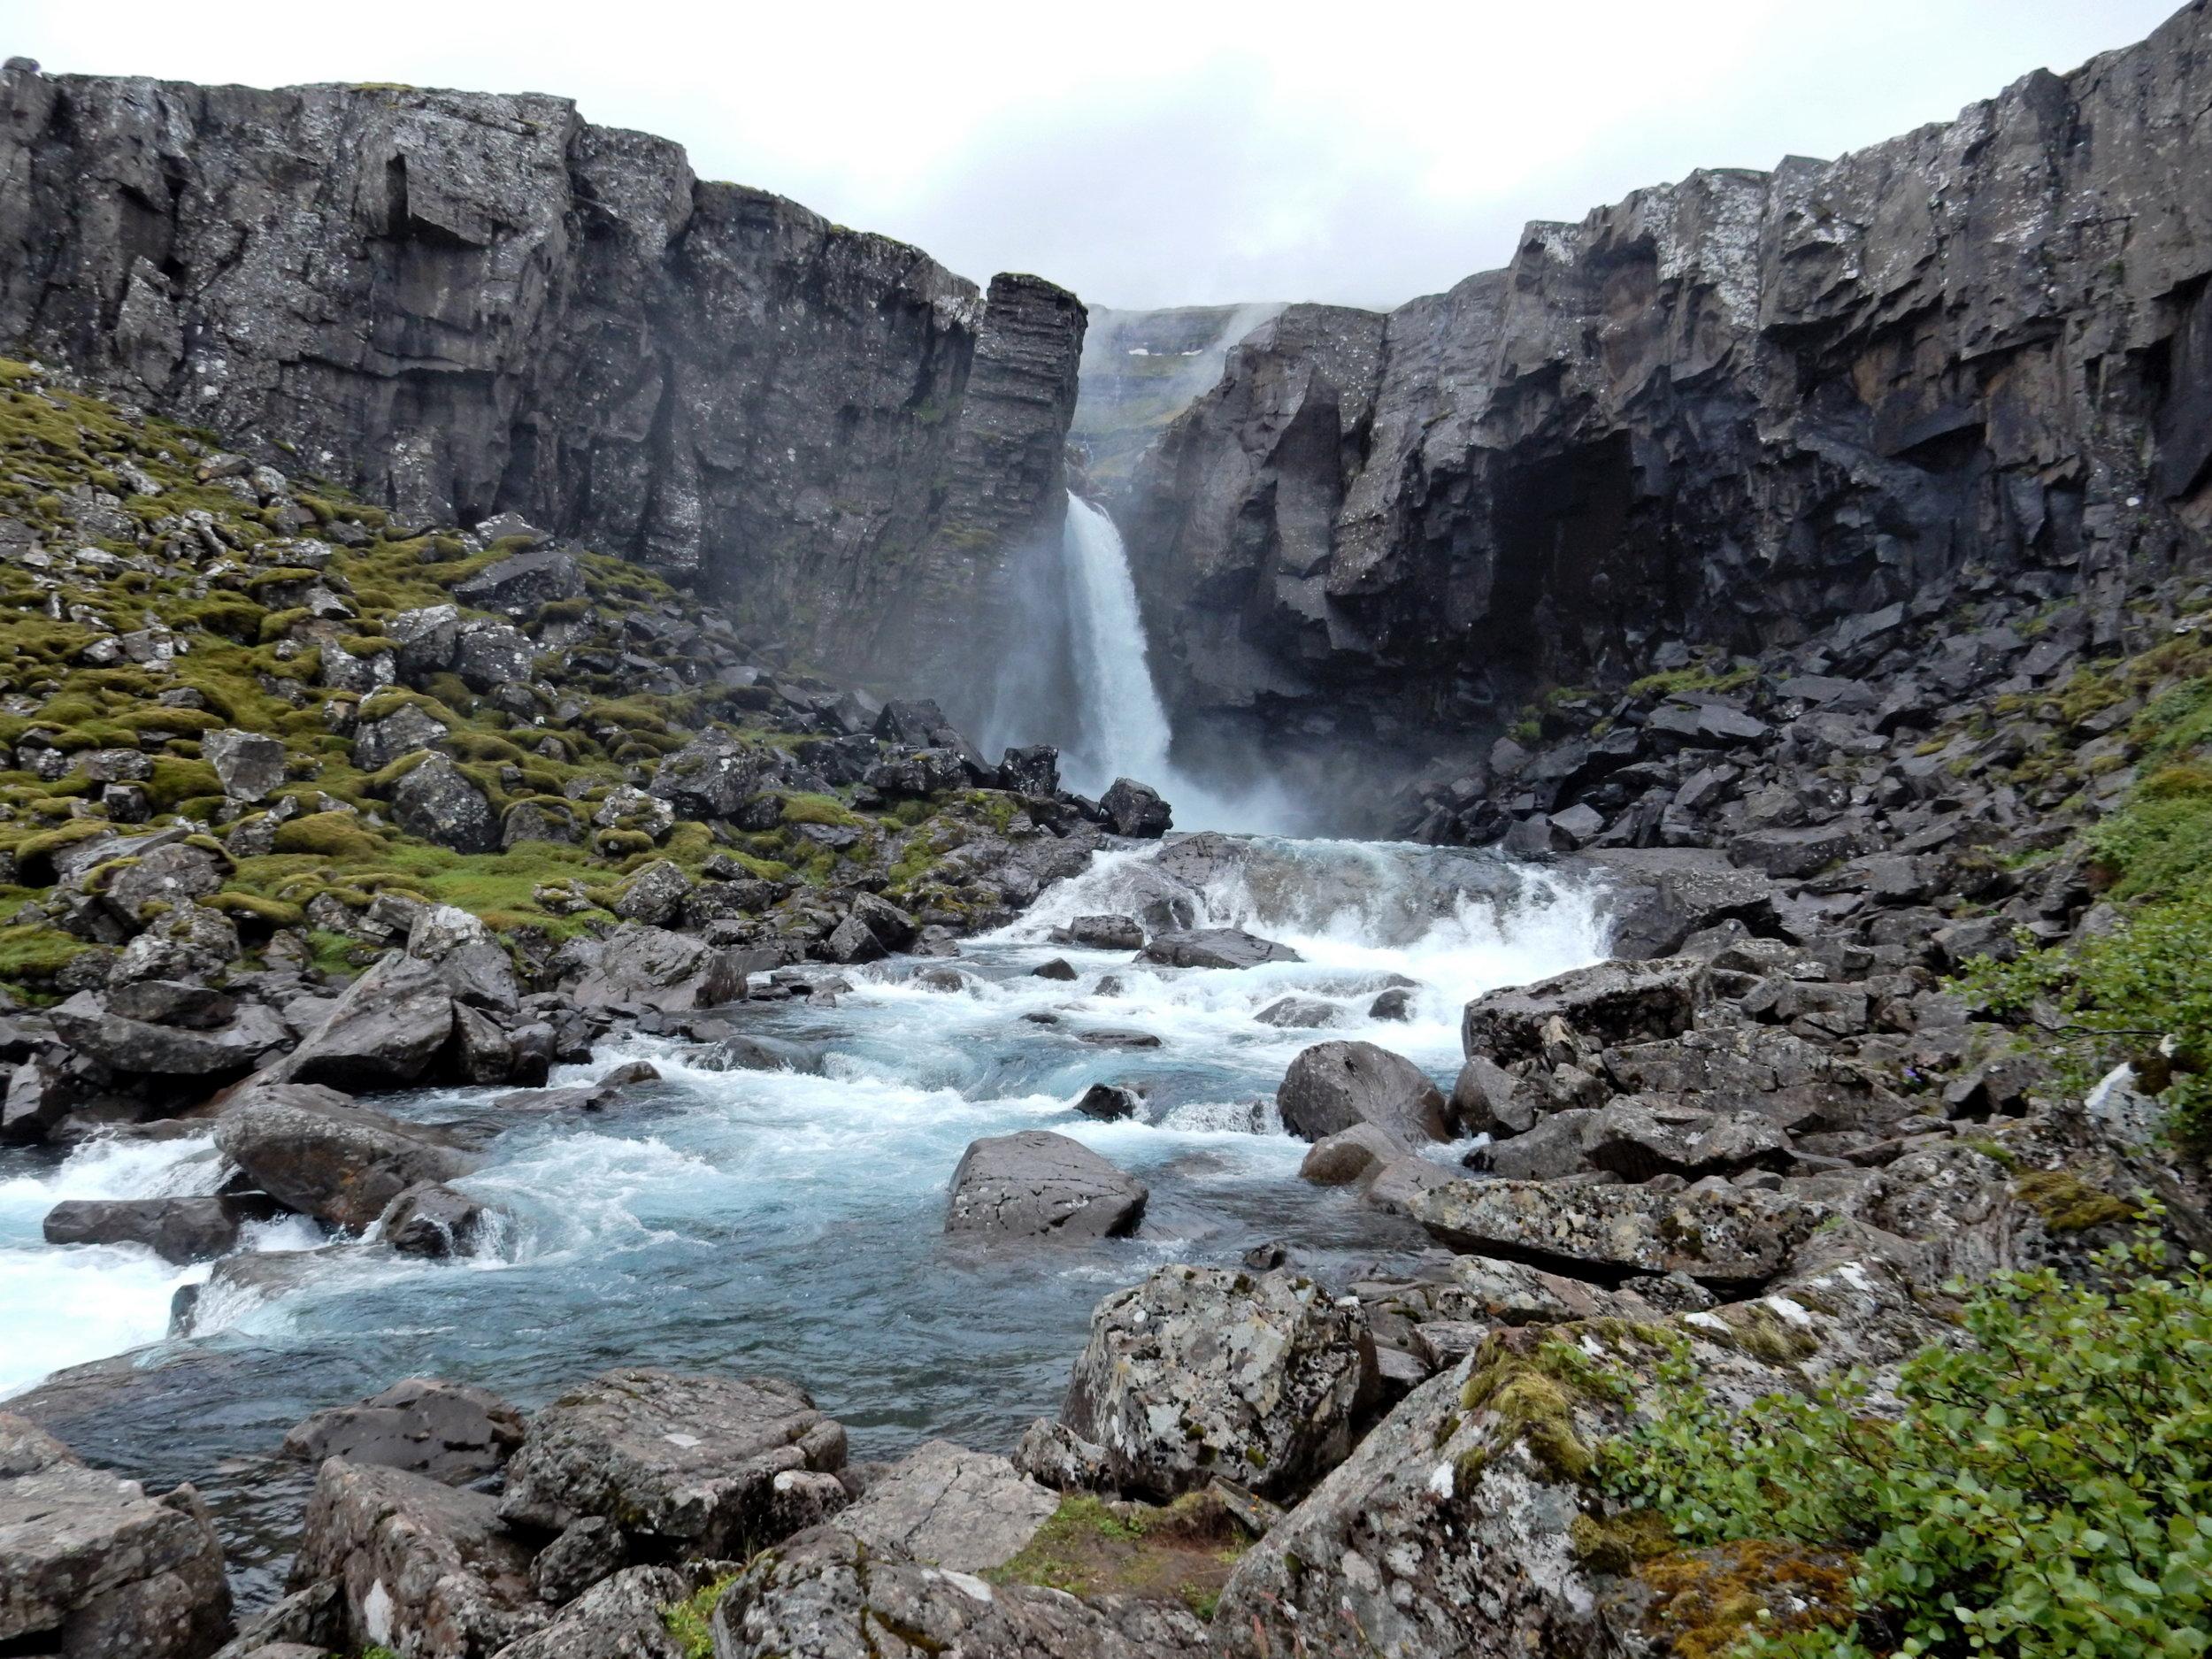 The Icelandic wilderness, June, 2016